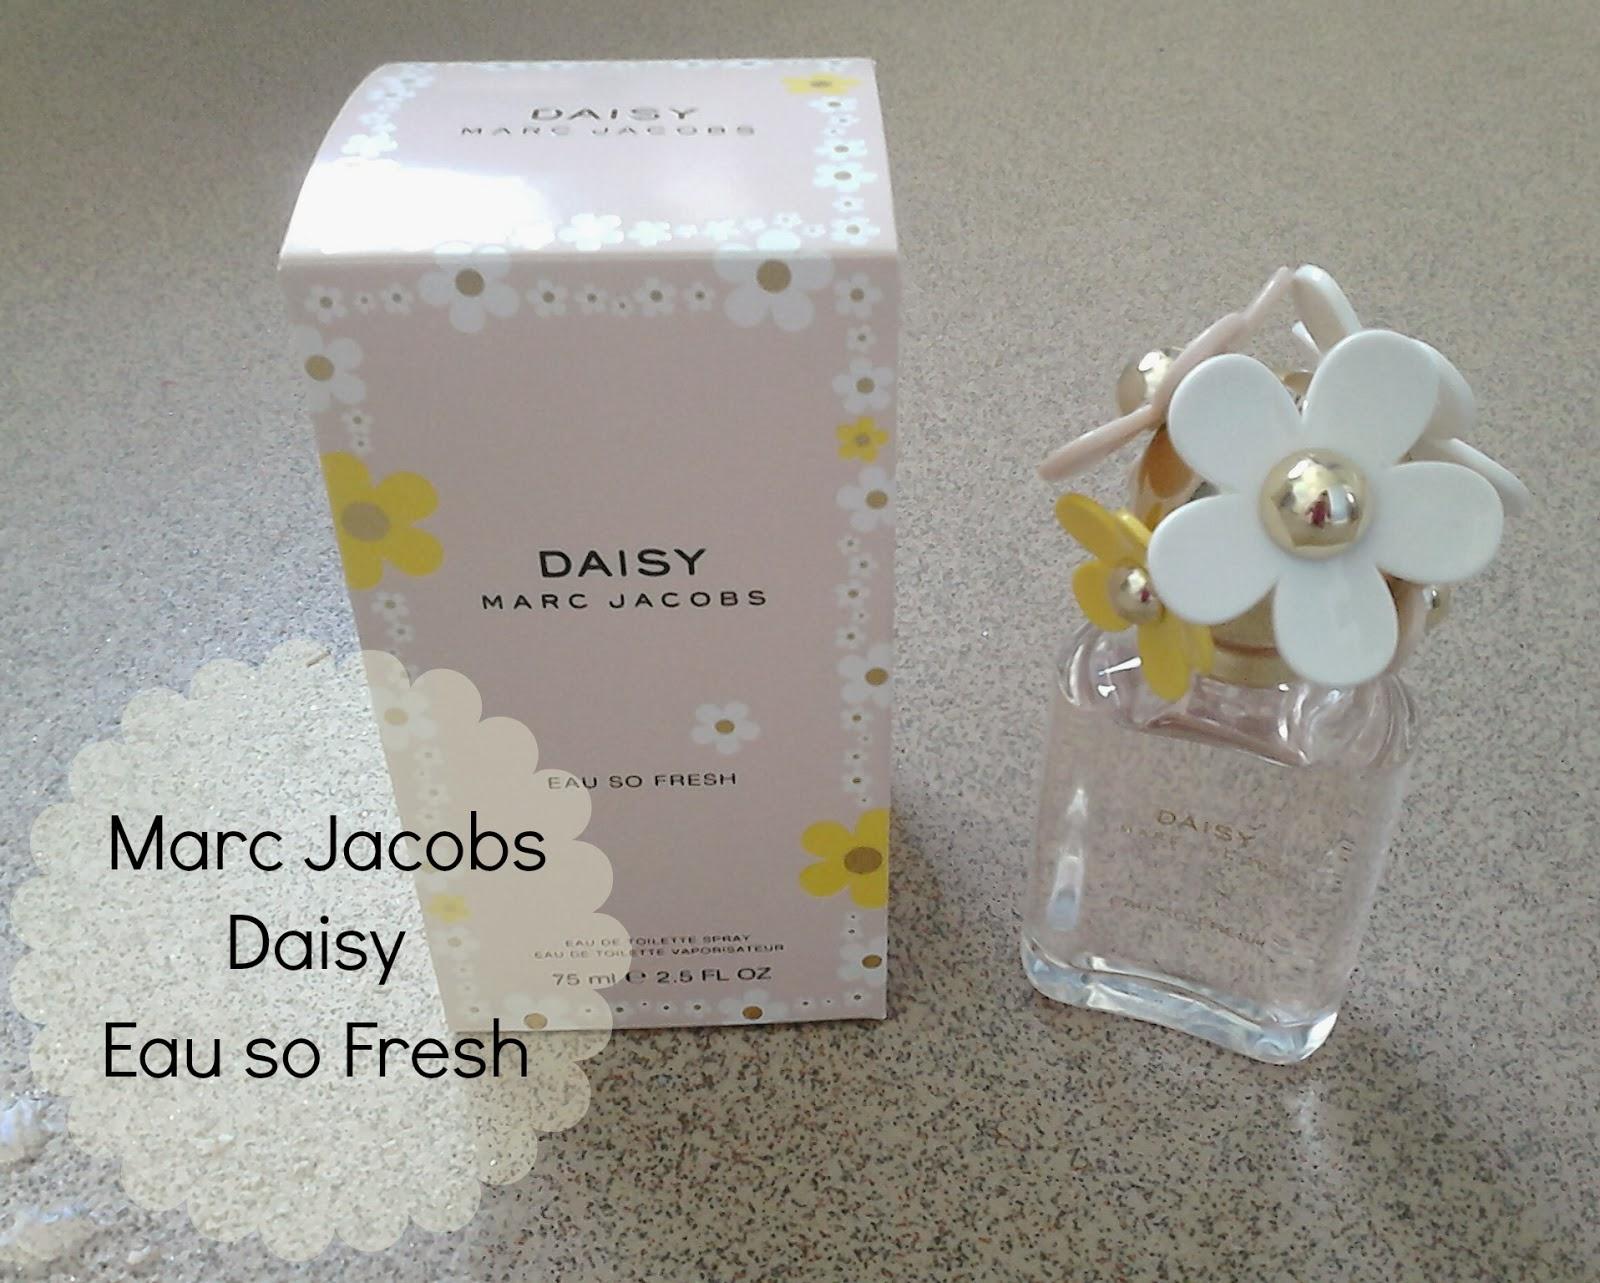 marc jacobs daisy eau so fresh review beauty division. Black Bedroom Furniture Sets. Home Design Ideas